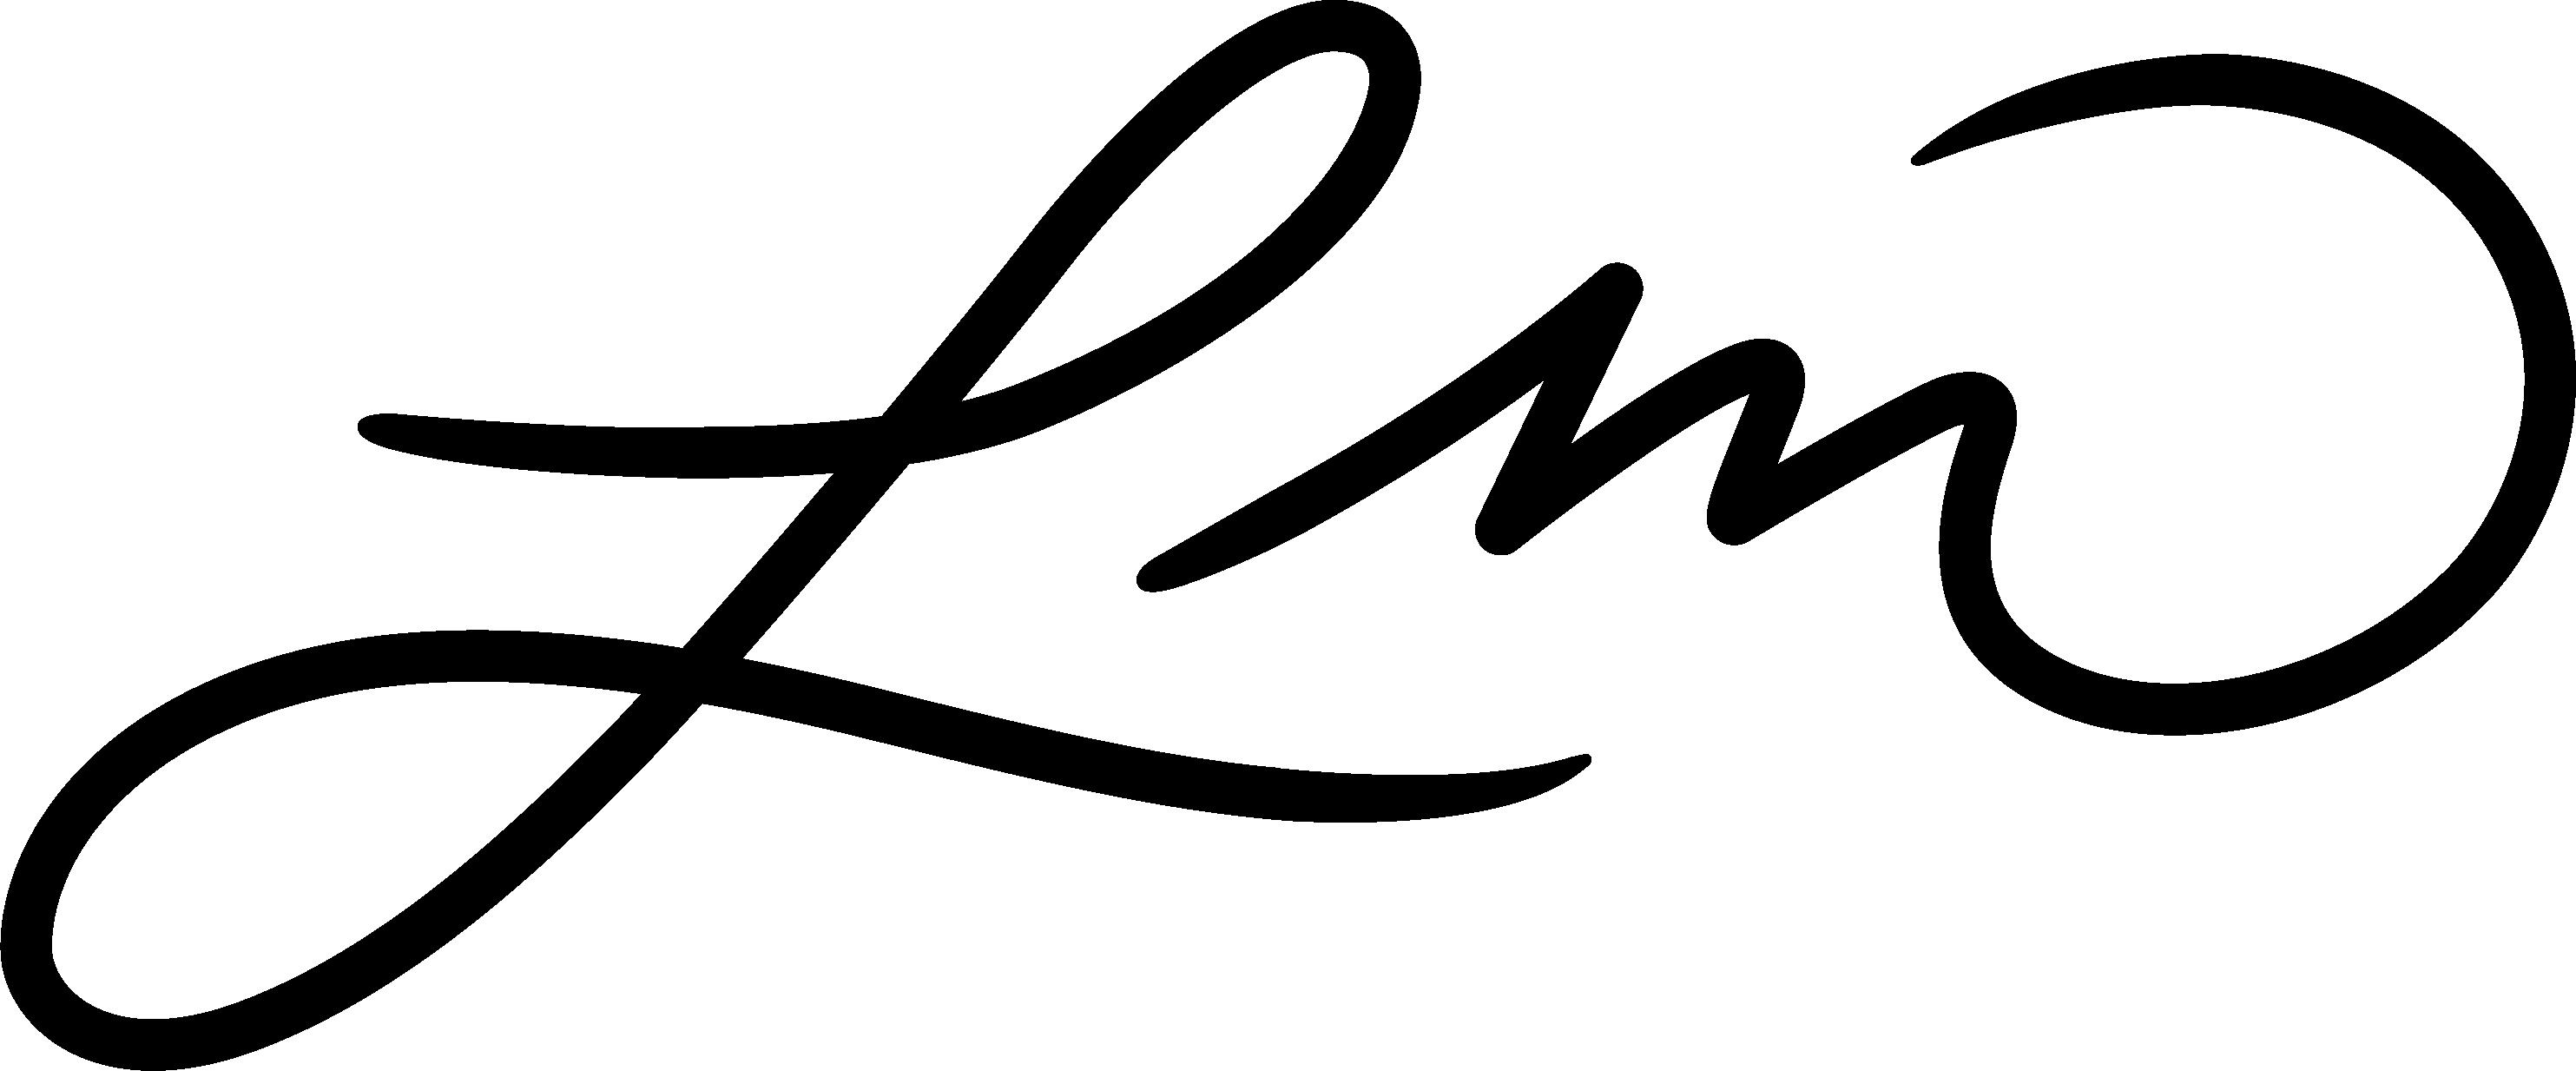 LM-wordmark